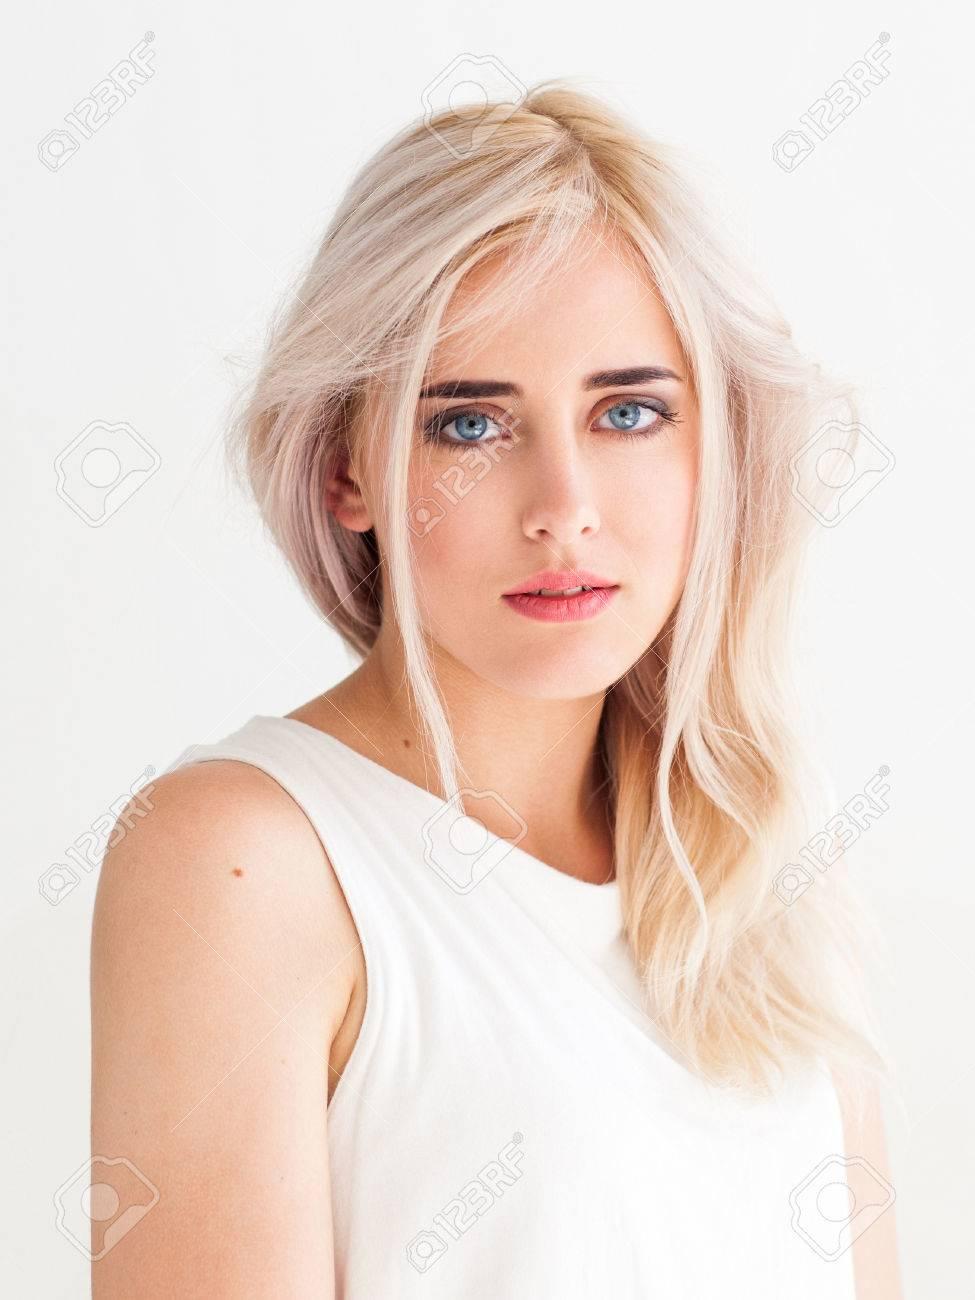 bianco ragazza nudo foto